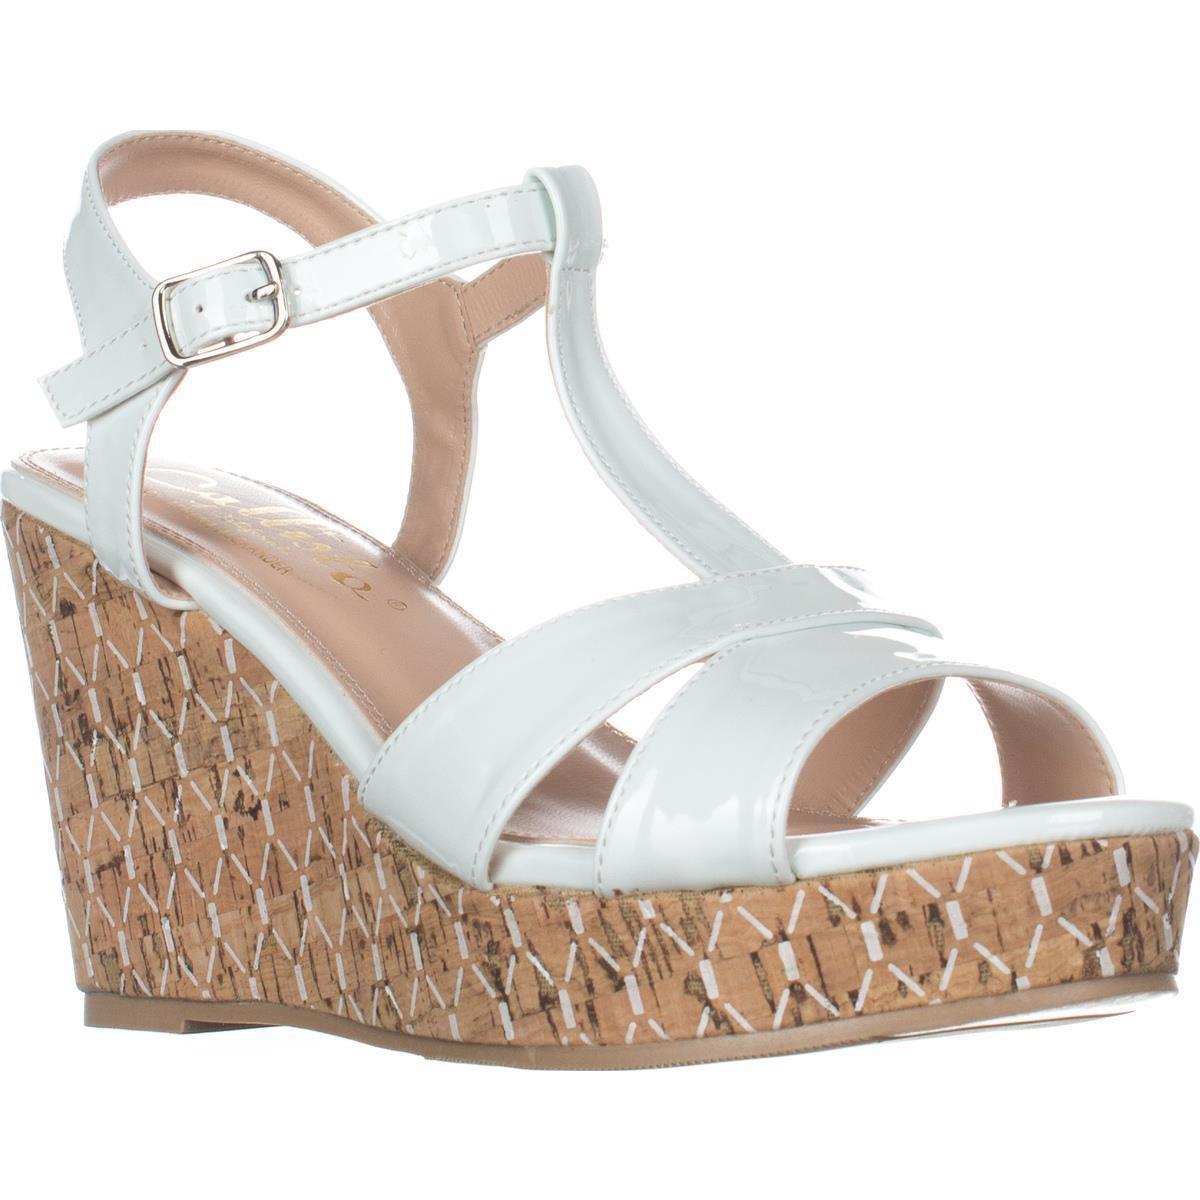 c5579c02fb9d Lyst - Callisto Aspenn T-strap Wedge Sandals in White